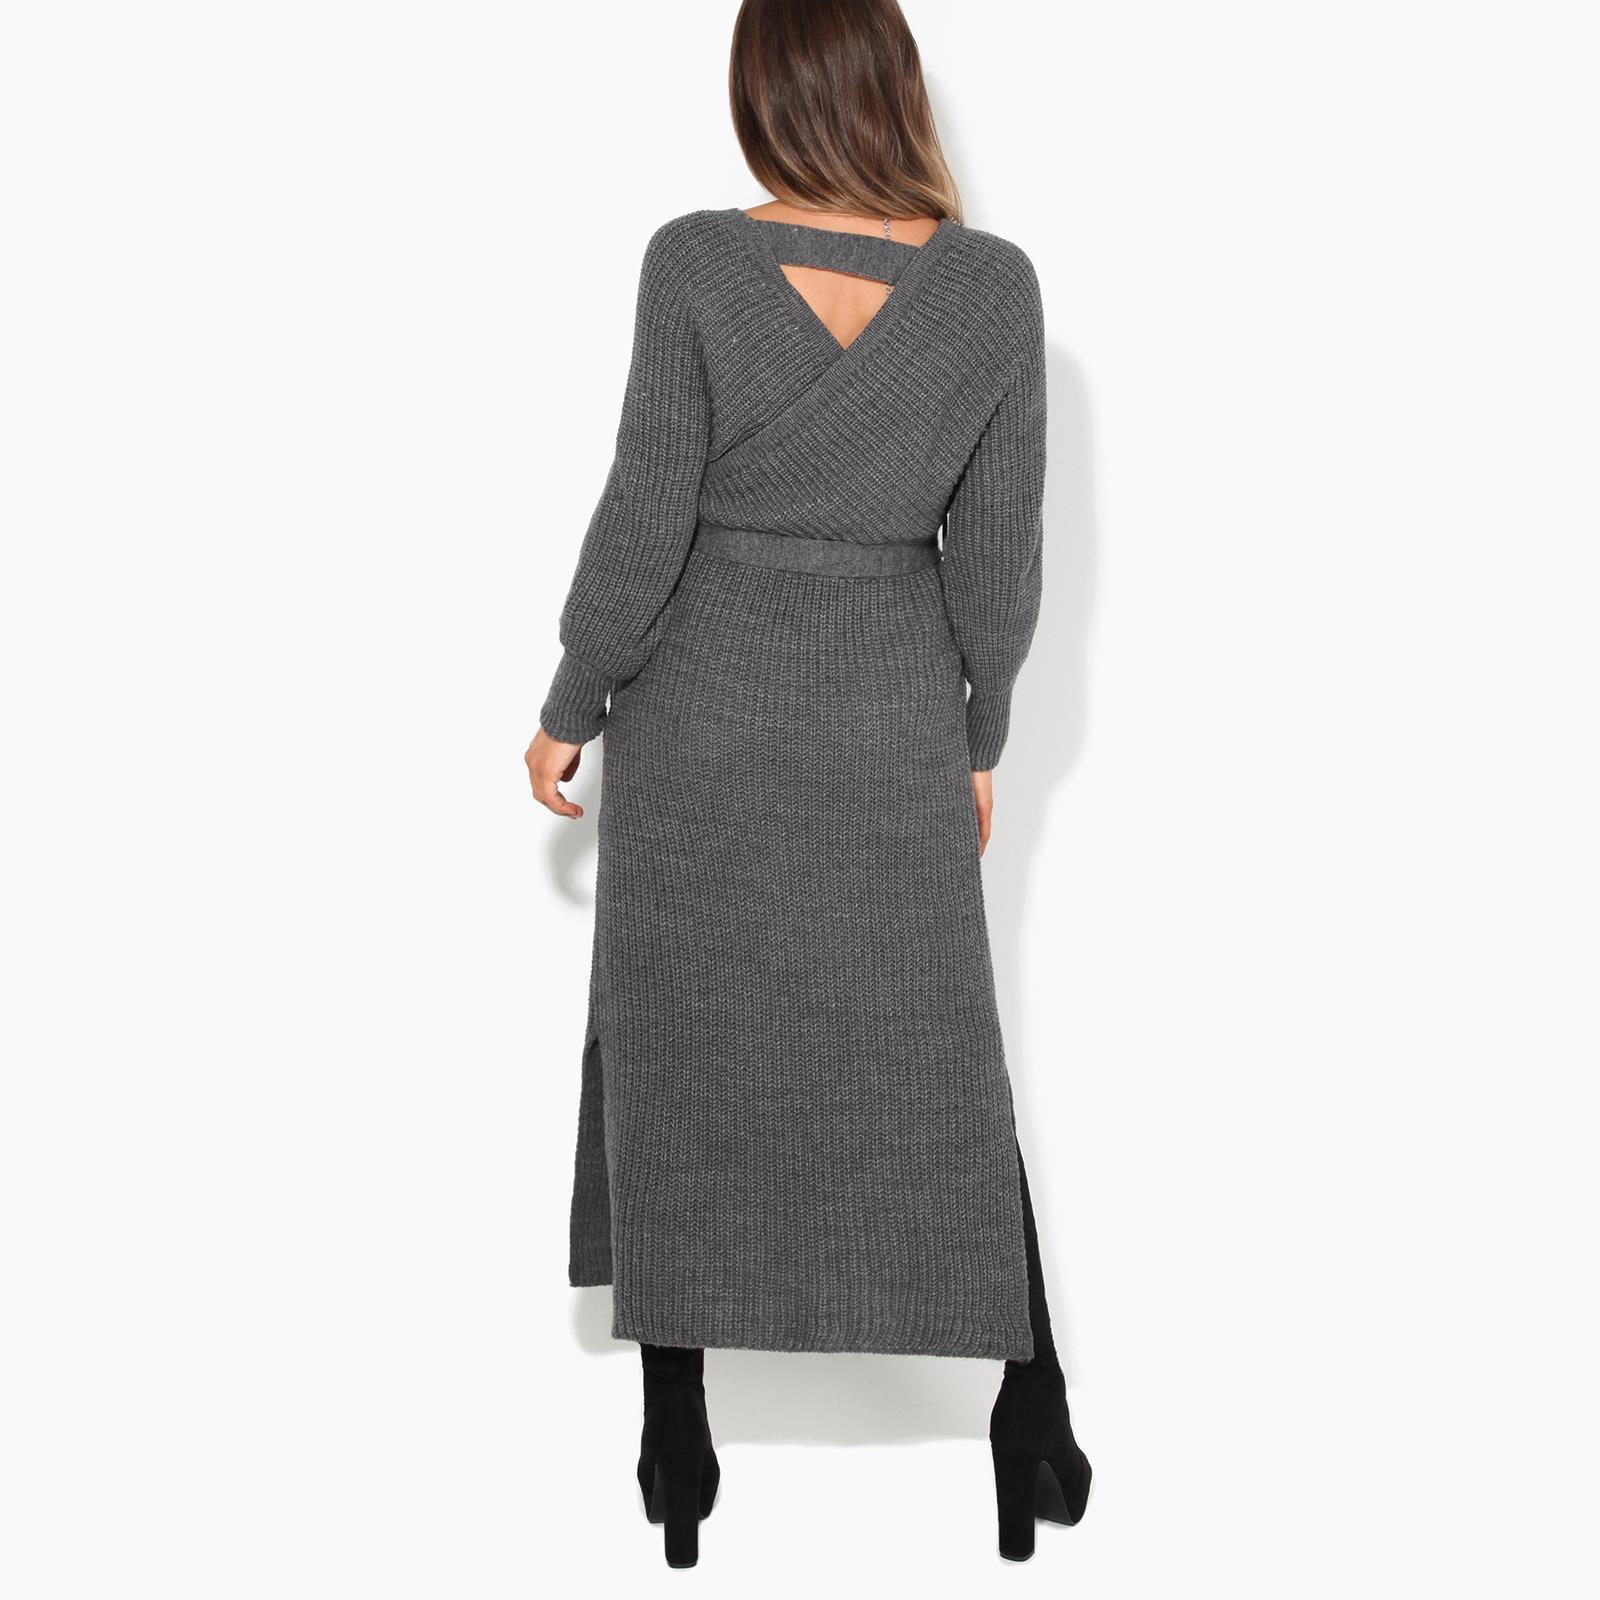 Womens-Ladies-Jumper-Dress-Chunky-Knit-Wrap-V-Neck-Maxi-Long-Sleeve-Winter-Top thumbnail 7